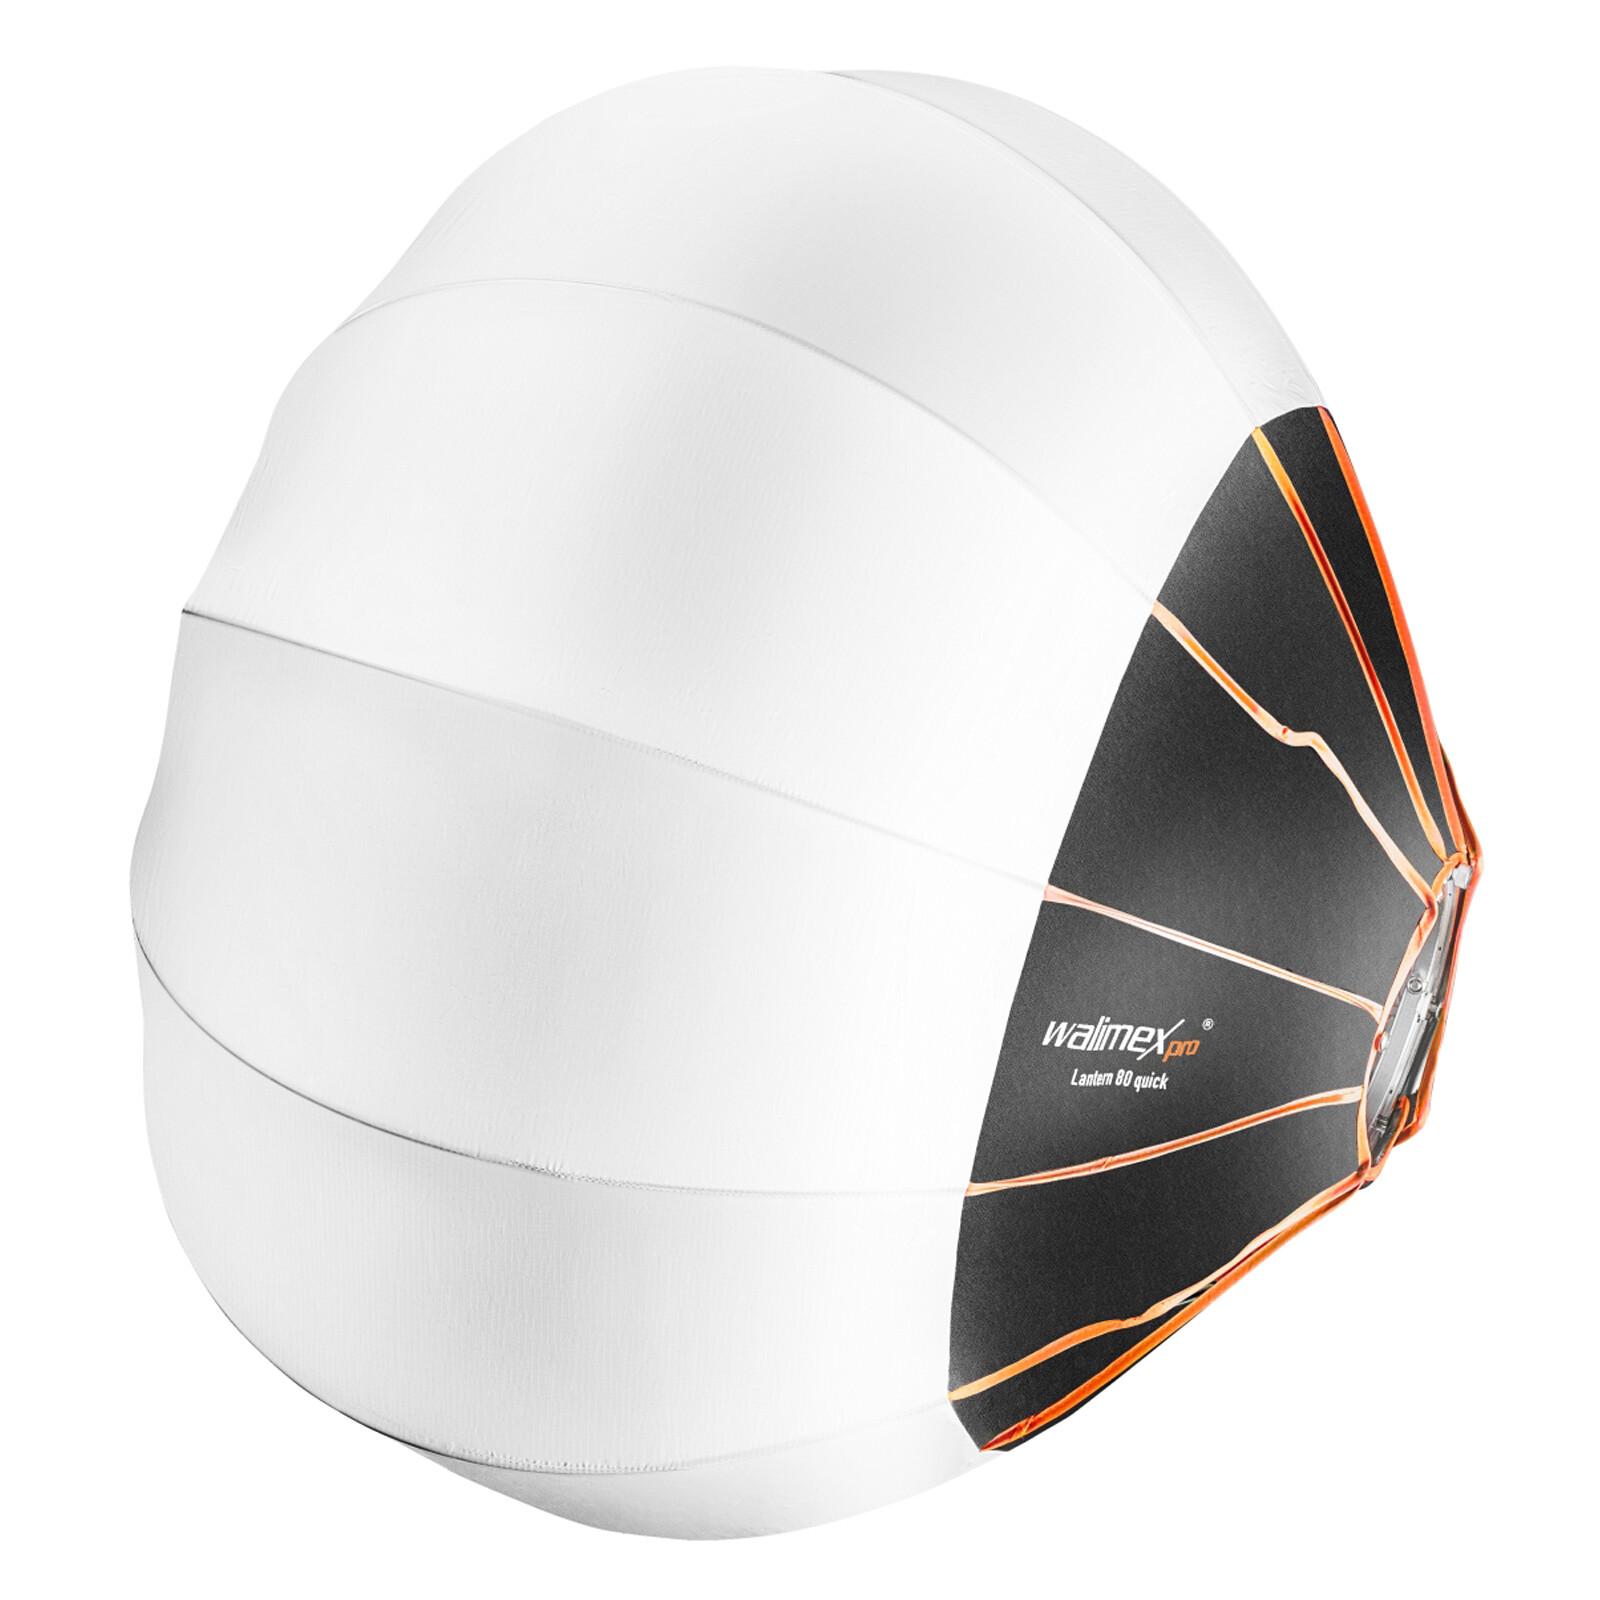 Walimex pro 360° Ambient Light Softbox 80cm